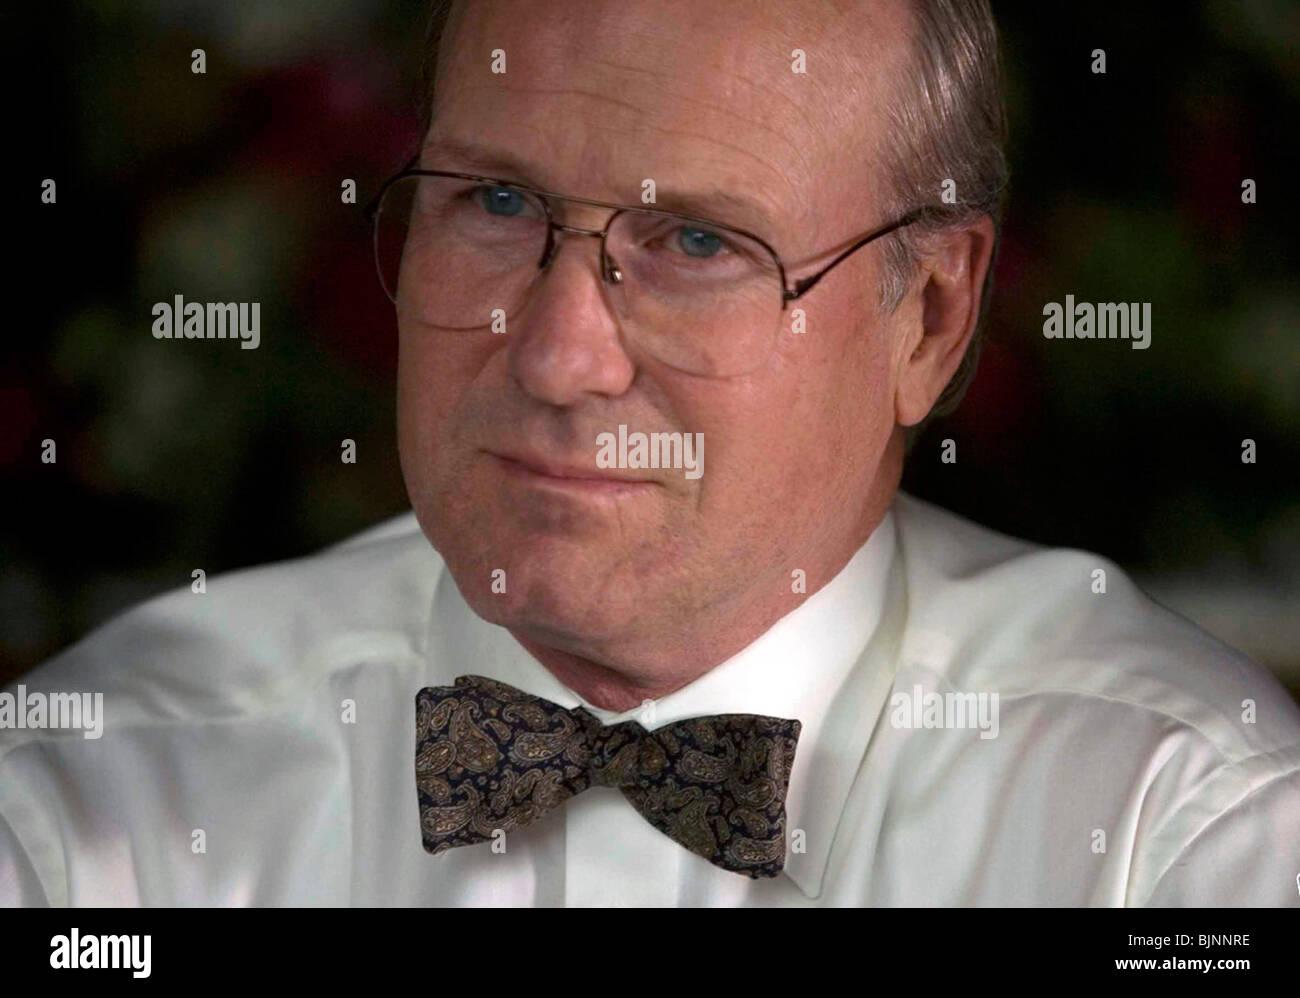 ENDGAME (2009) CHIWETEL EJIOFOR PETE TRAVIS (DIR) 002 - Stock Image